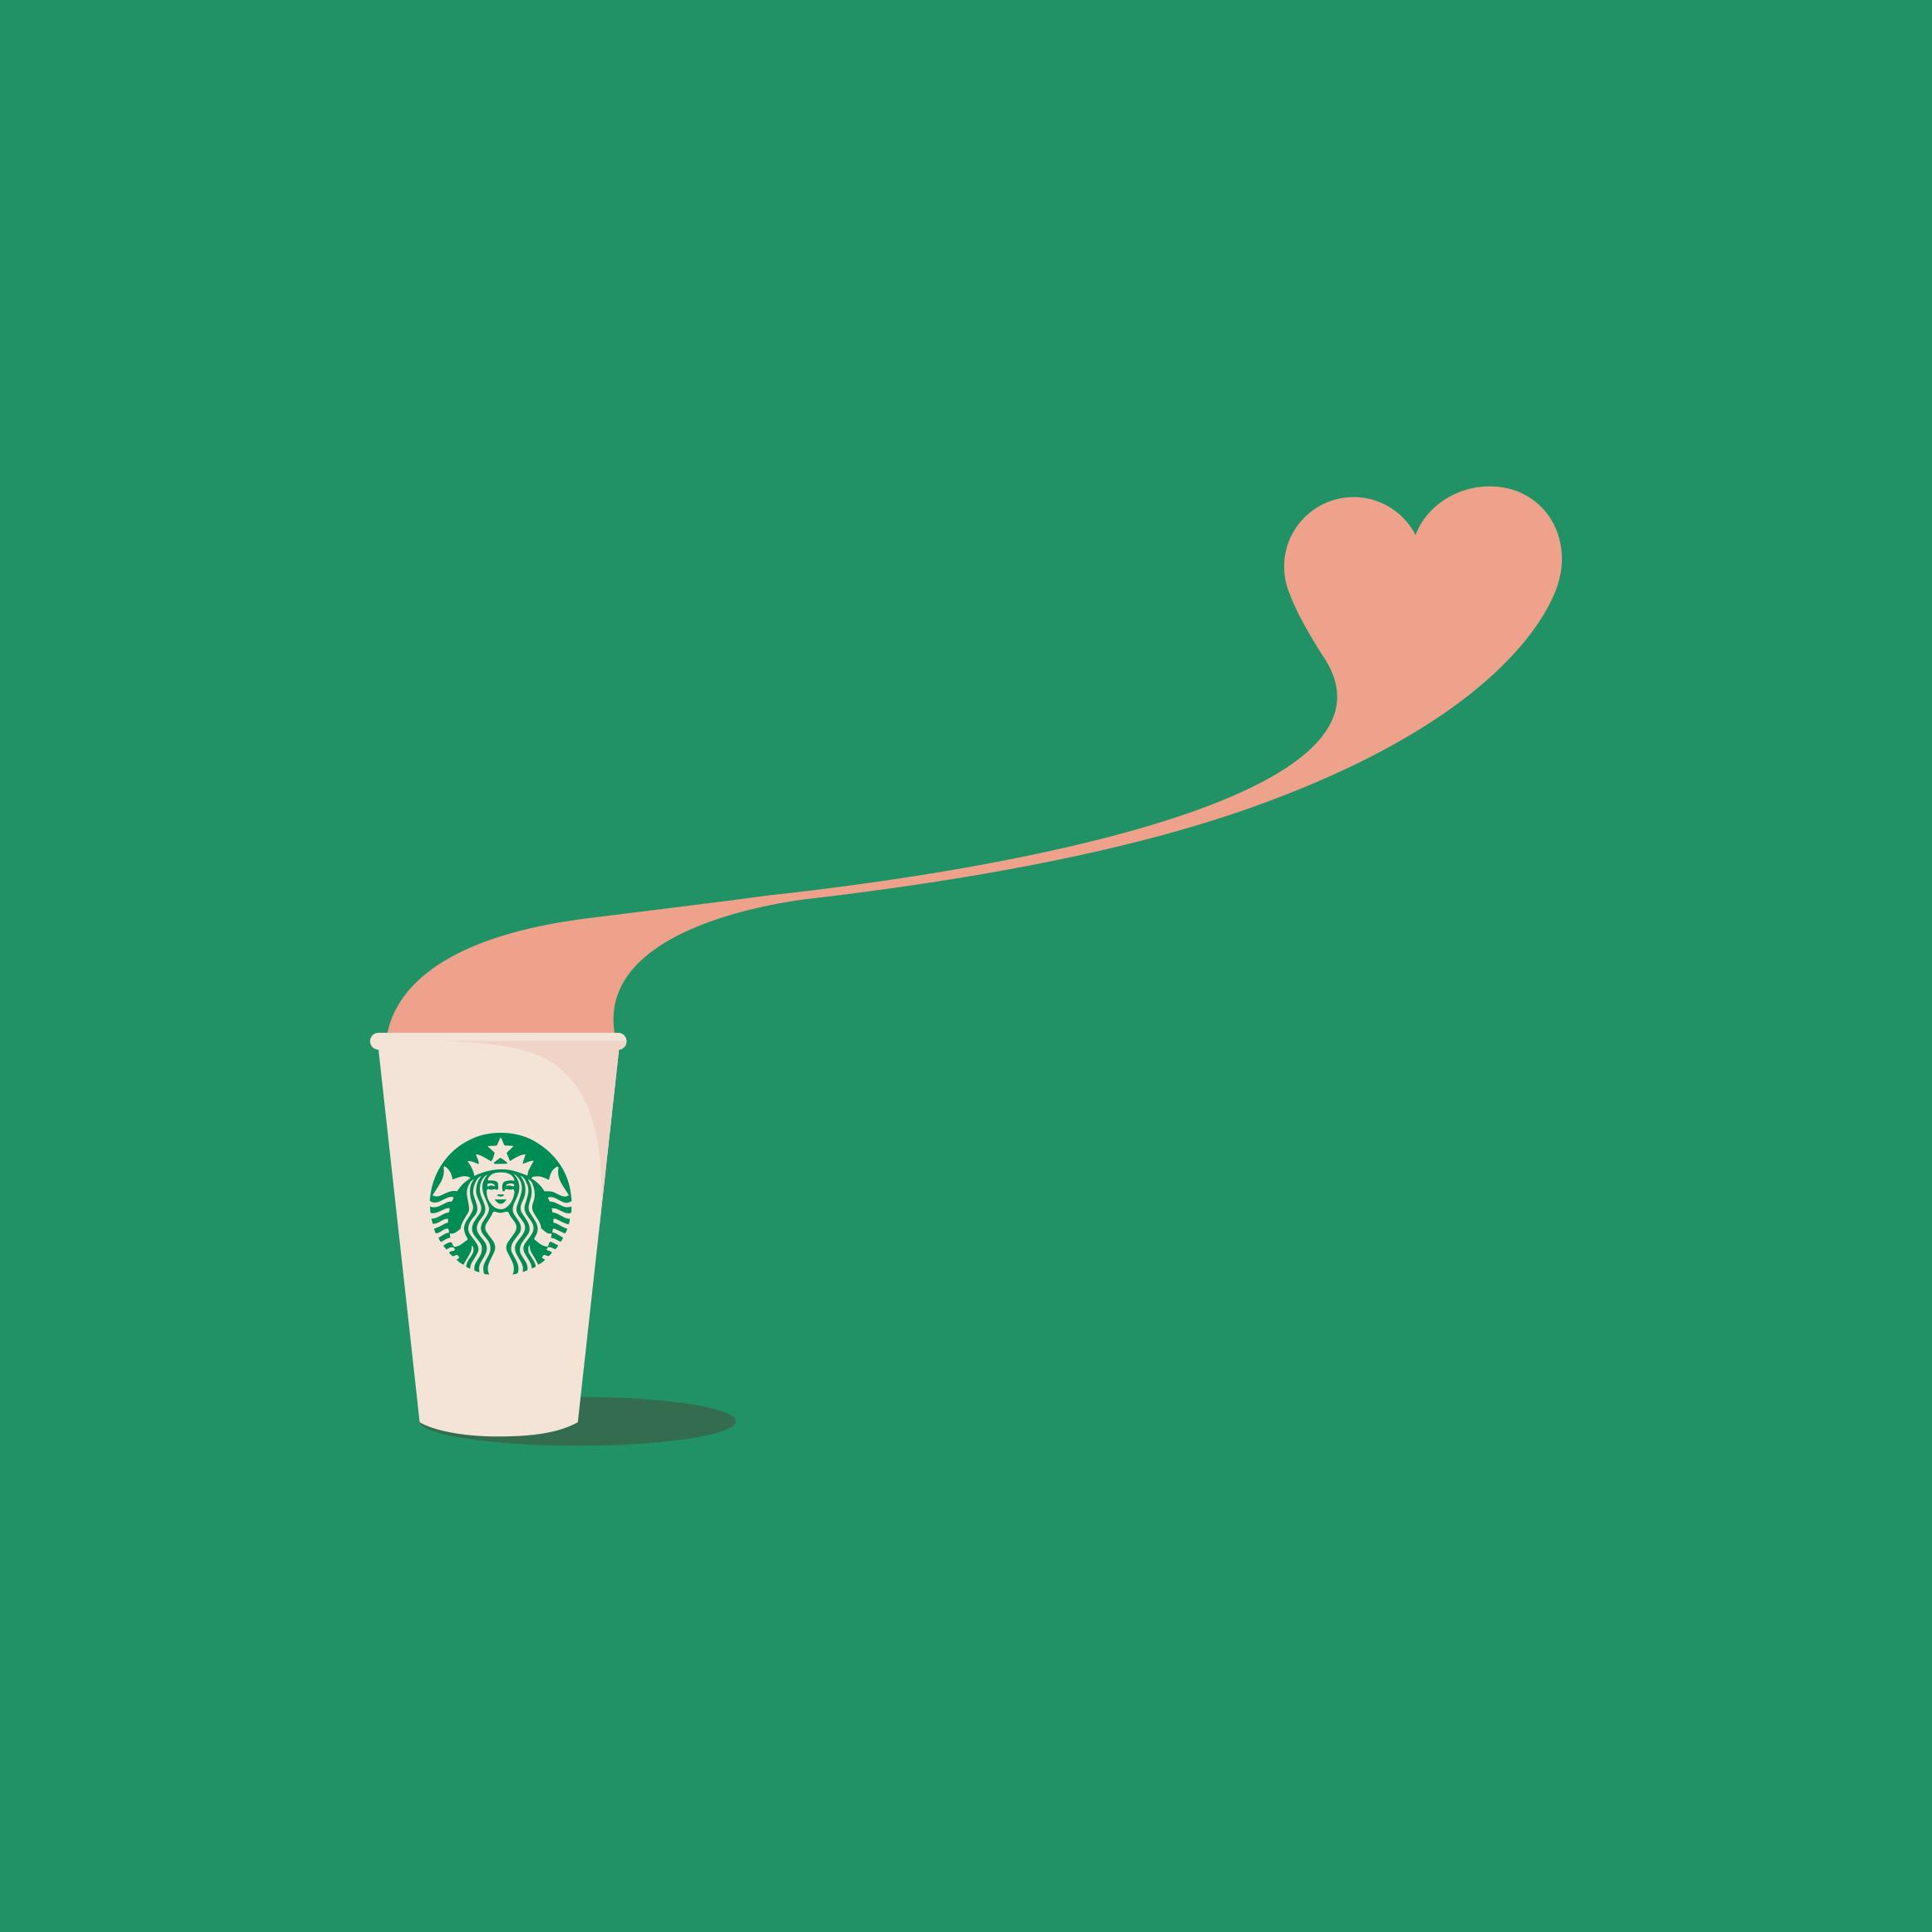 Starbucks; Project HOPE.